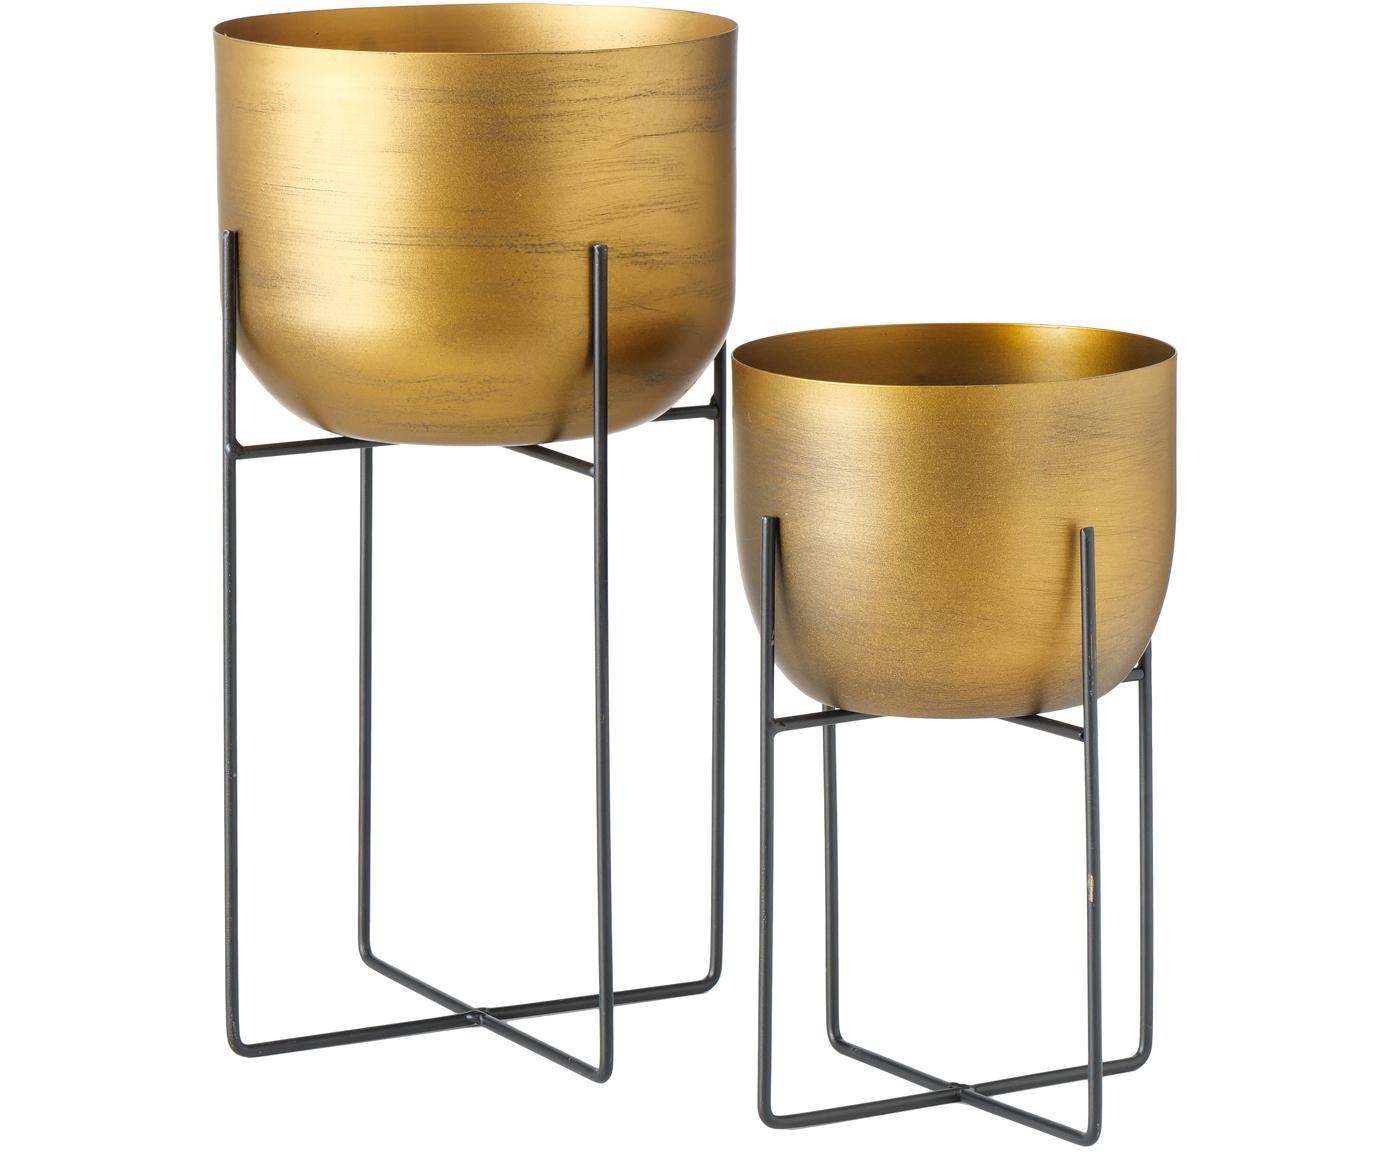 Set 2 portavasi in metallo Gadal, Metallo rivestito, Ottonato, Set in varie misure